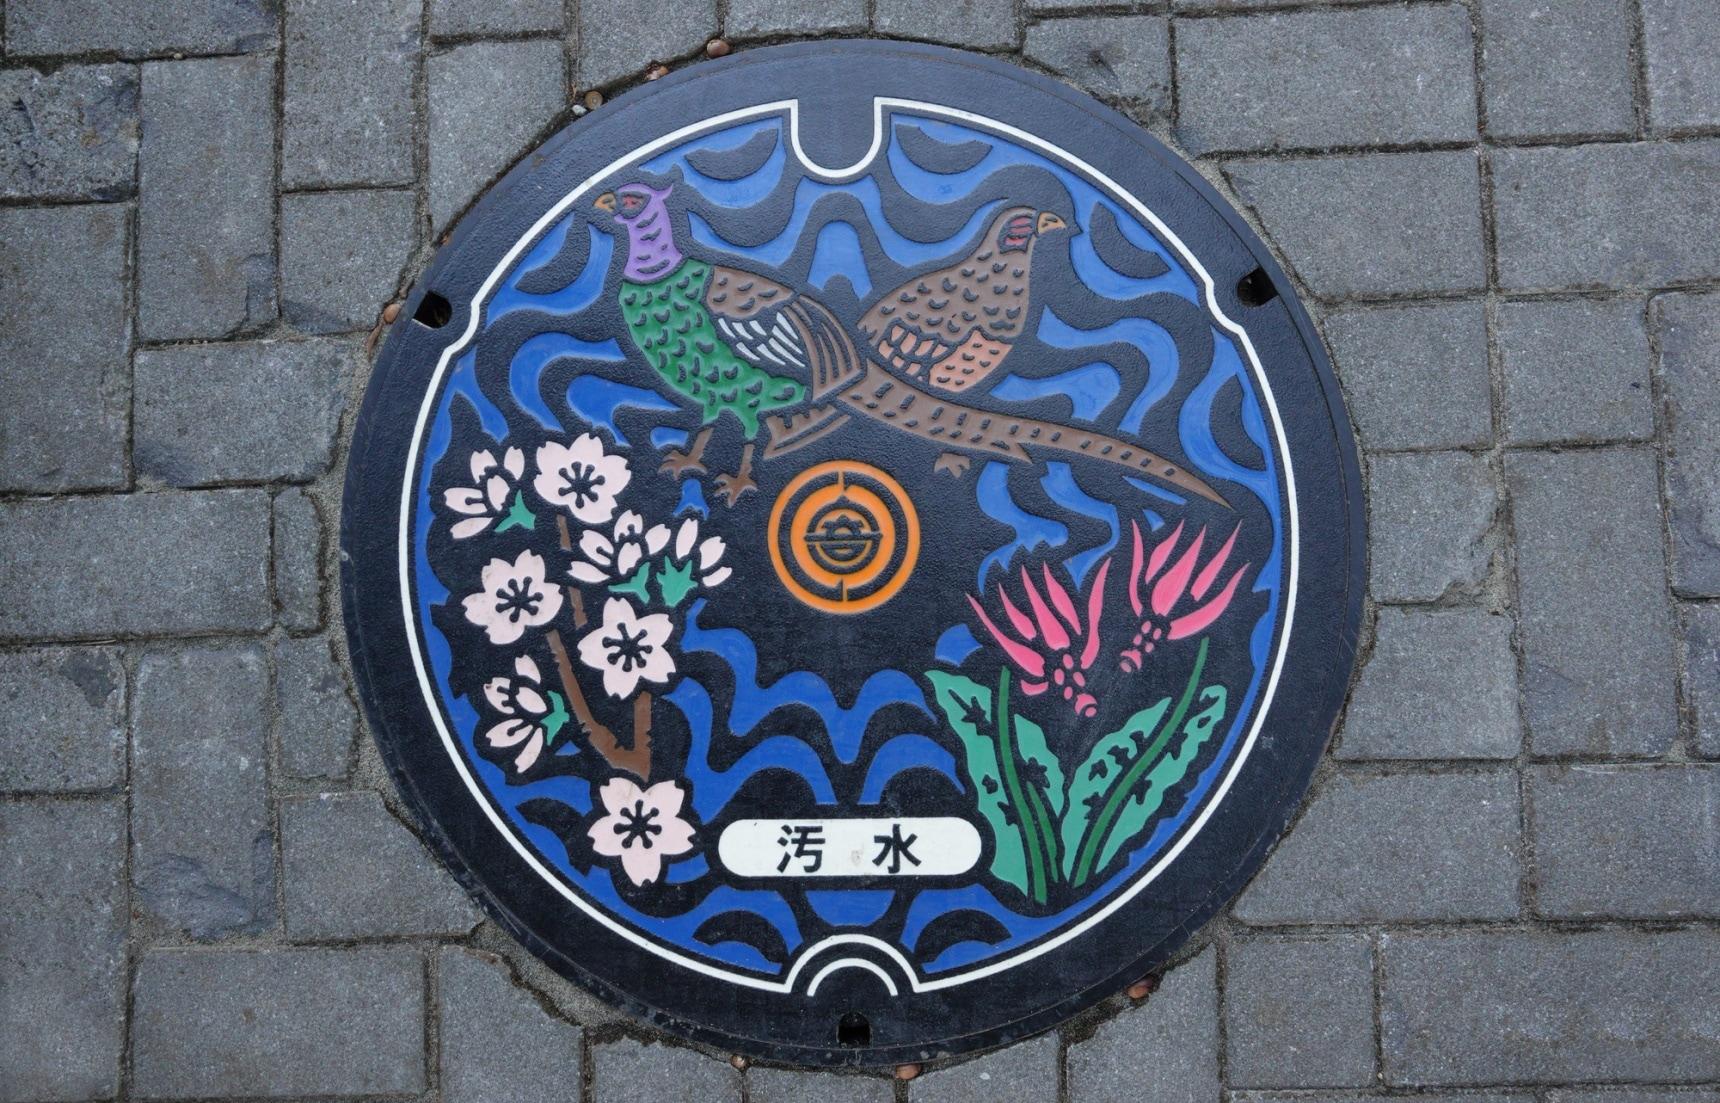 Japanese Manholes: Art Under Your Feet